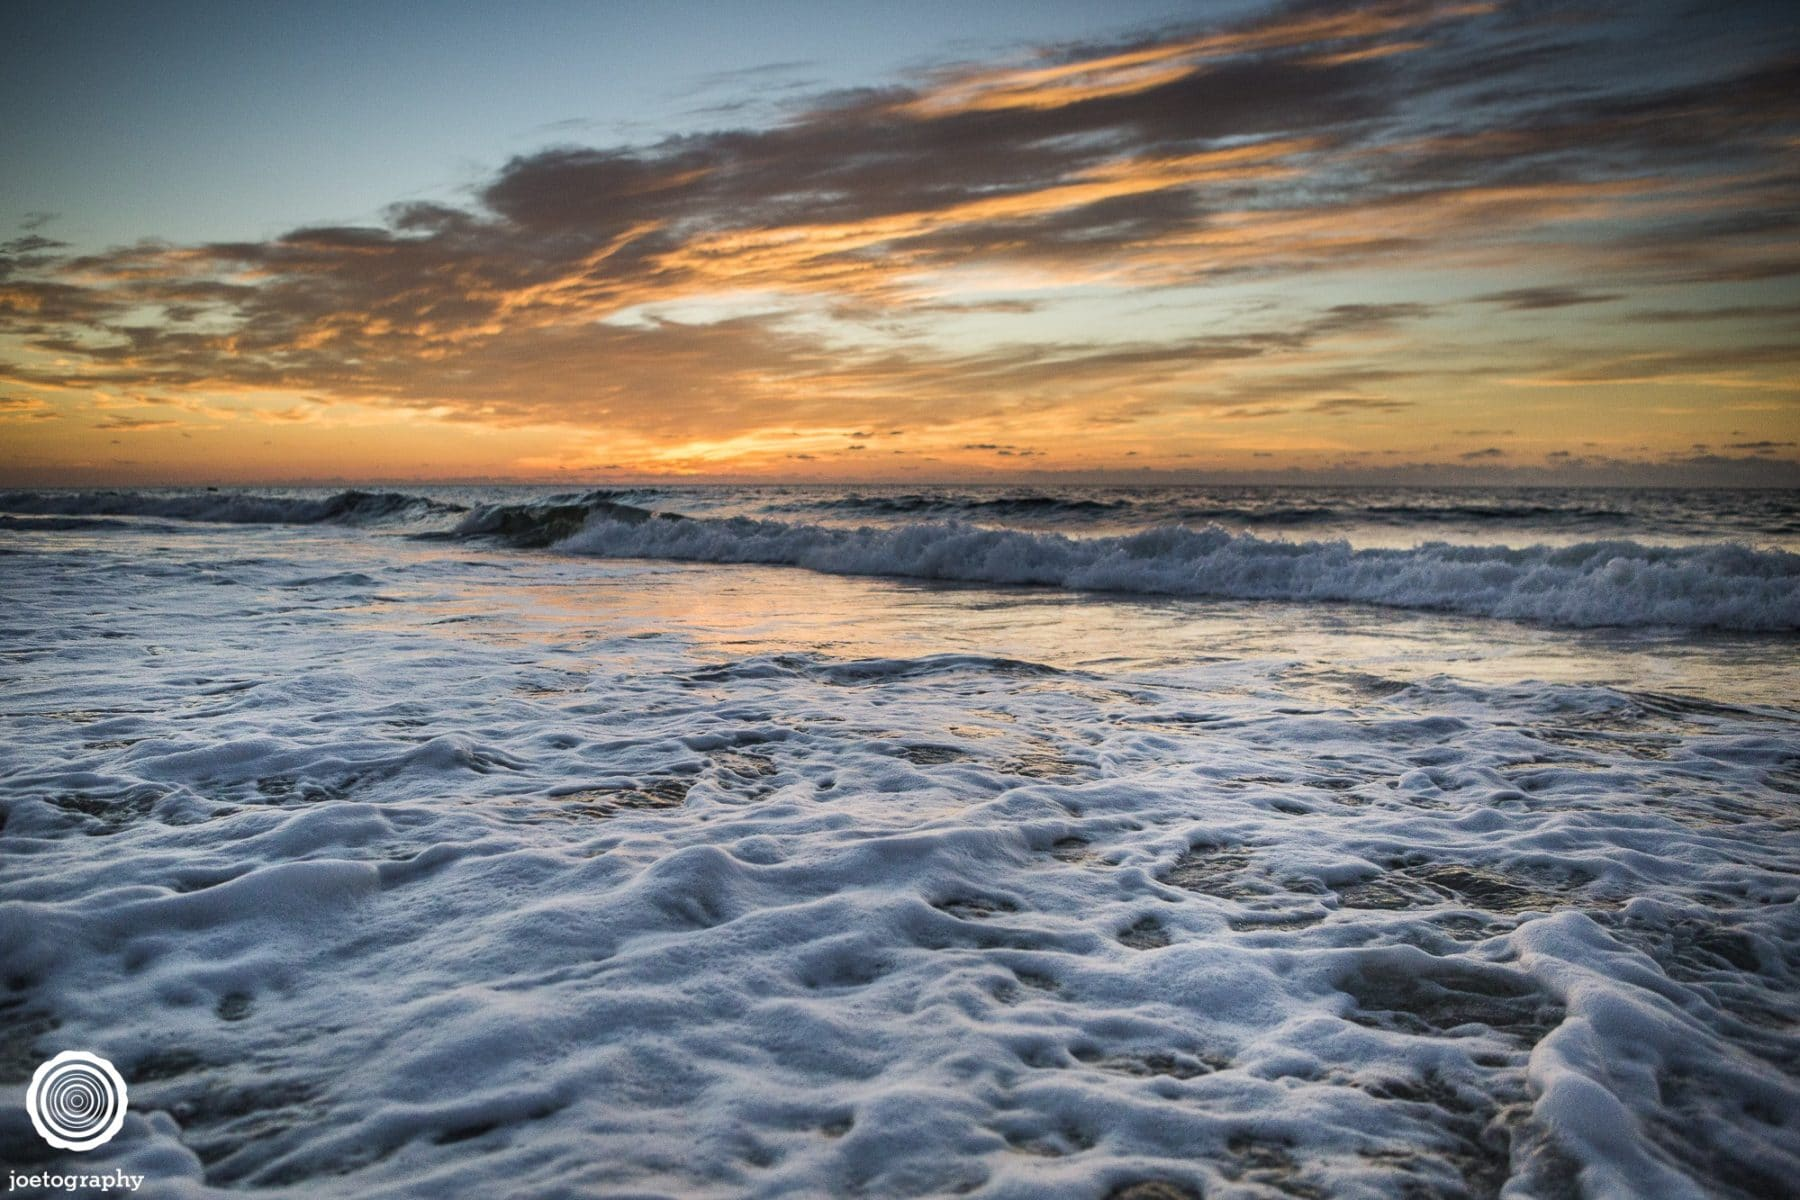 Outer-Banks-North-Carolina-Travel-Photography-26